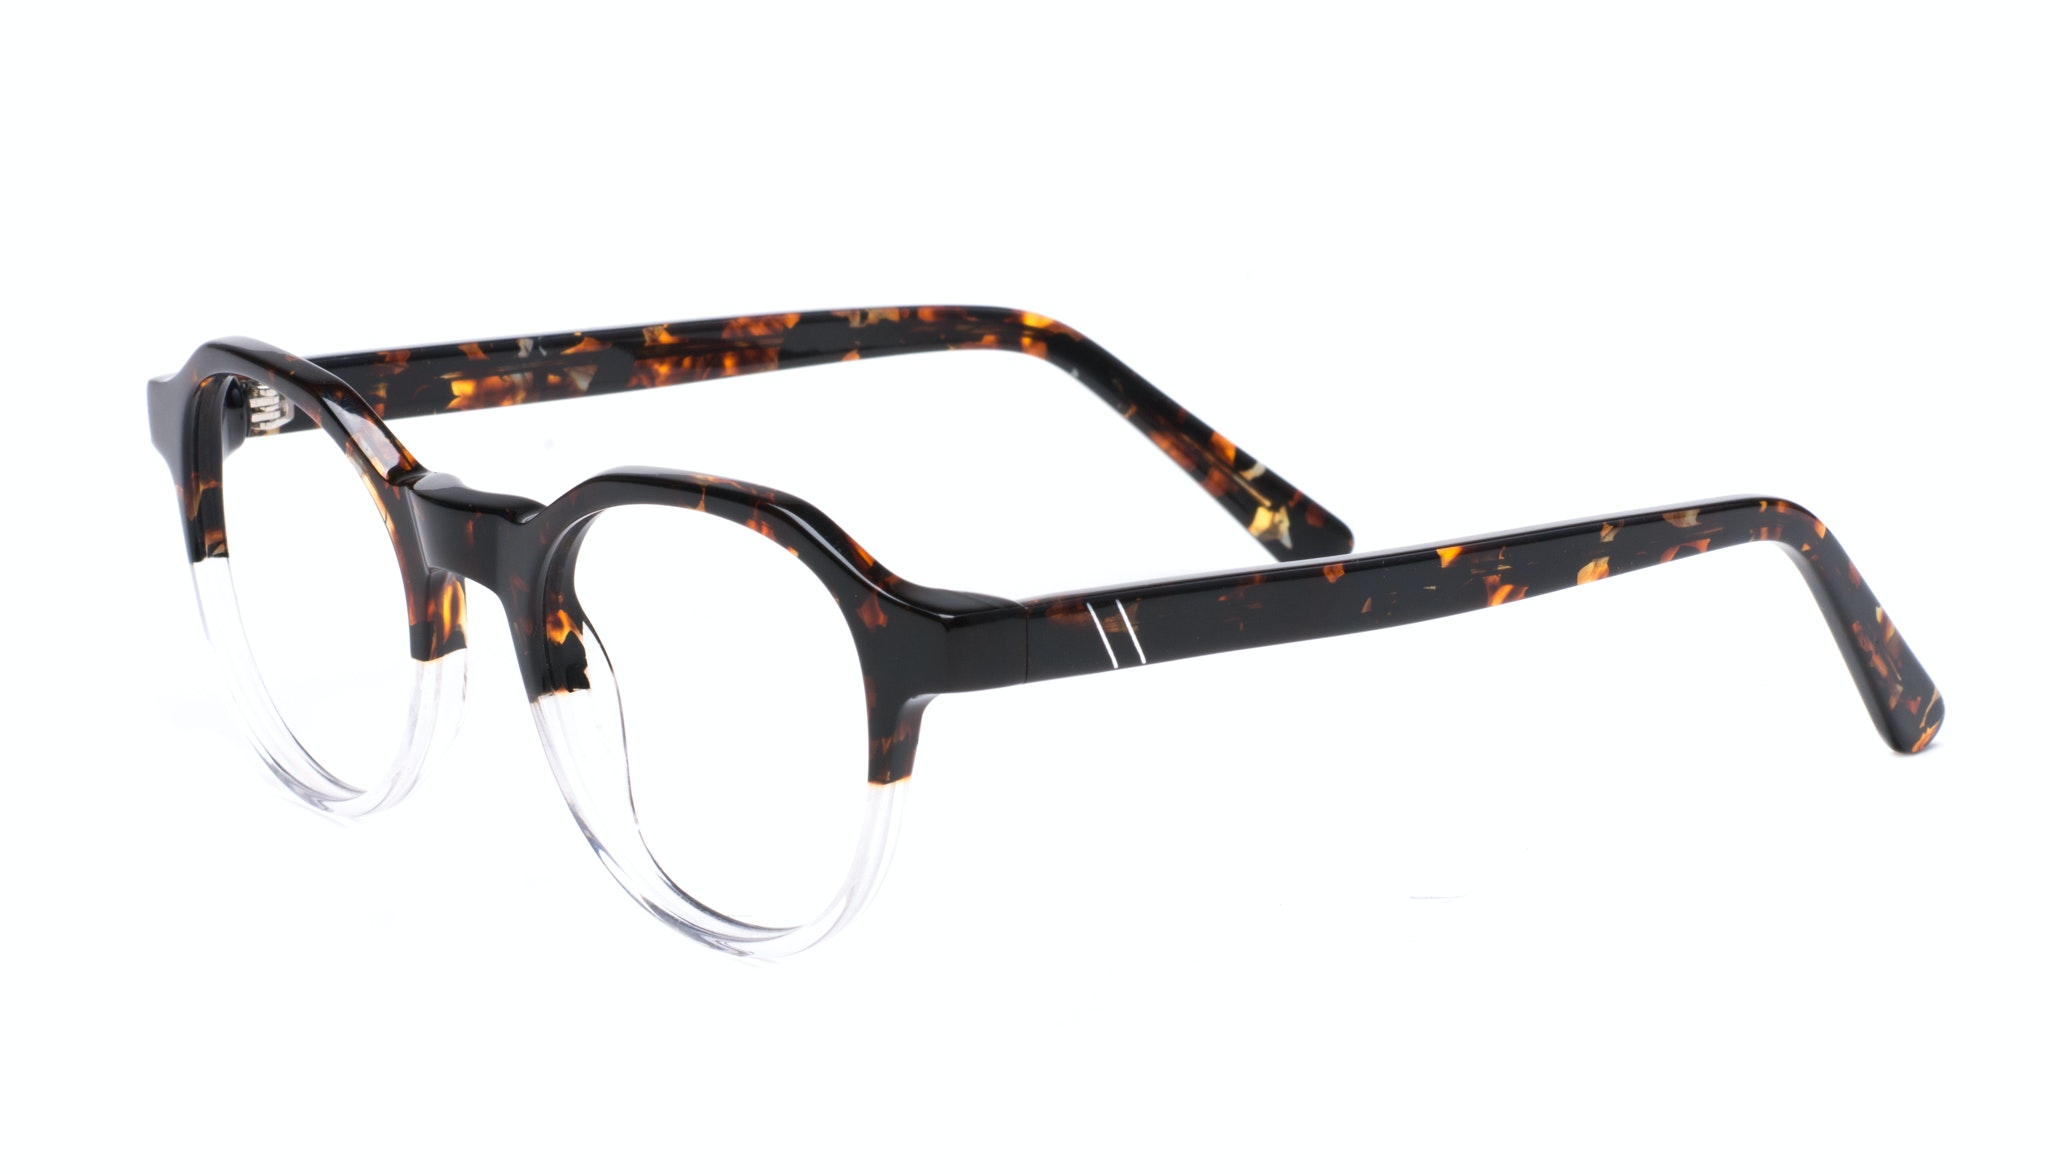 Affordable Fashion Glasses Round Eyeglasses Men Form Mahogany Clear Tilt